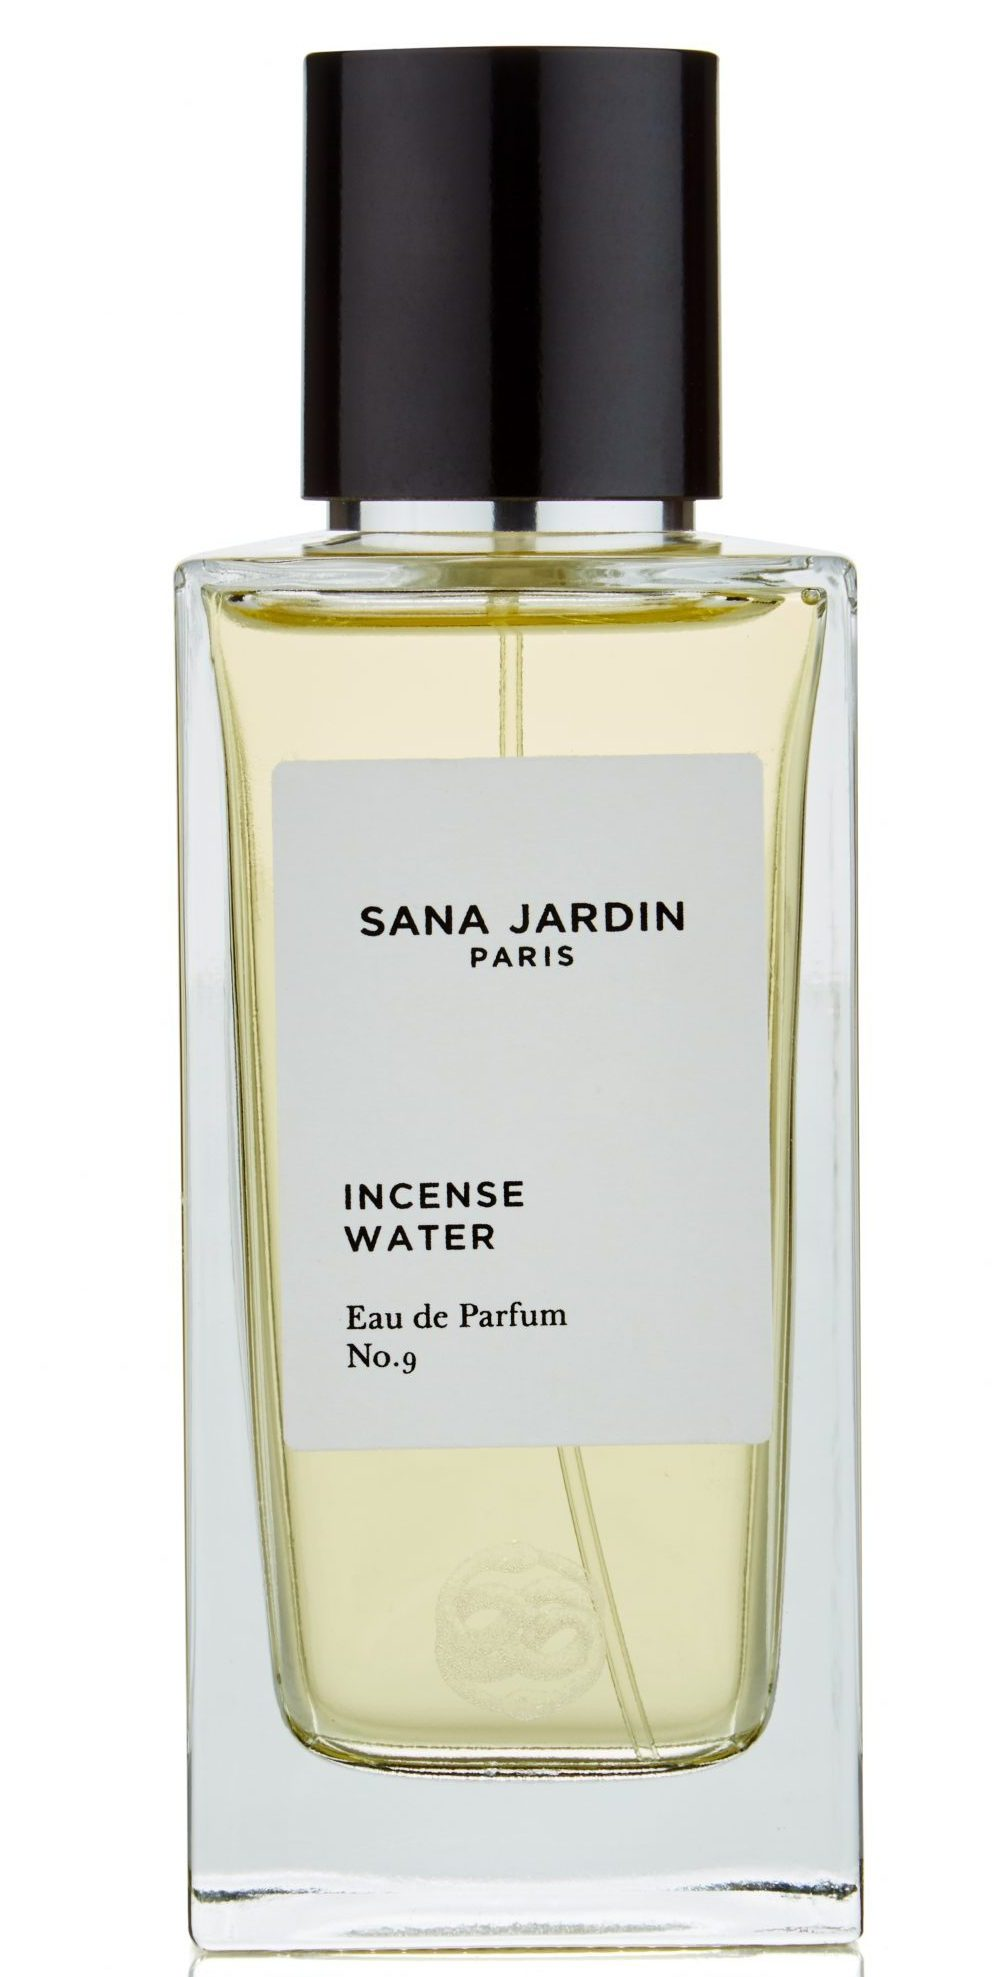 SANA_JARDIN_INCENSE_WATER